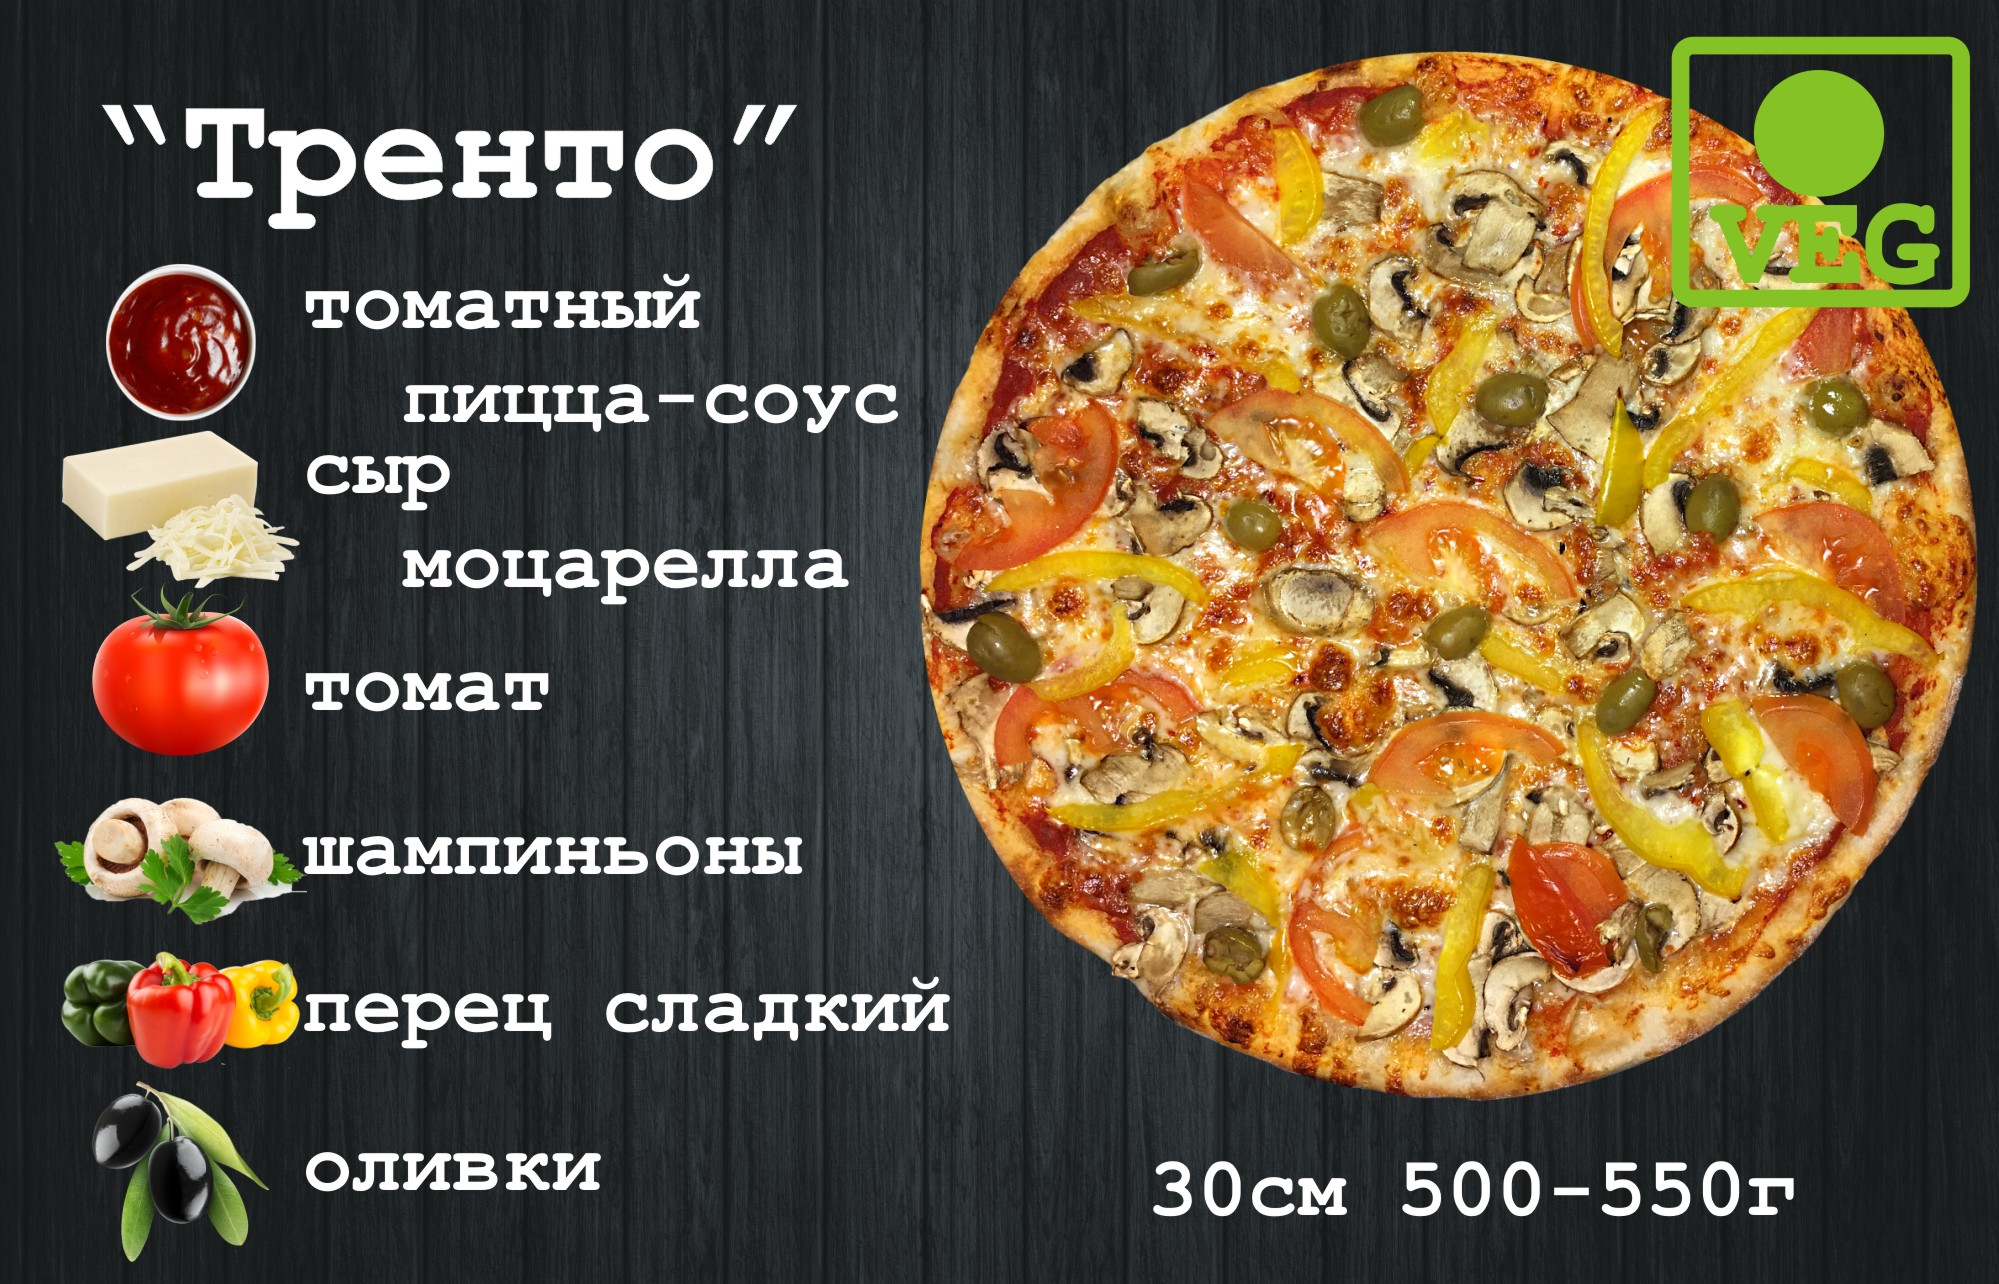 Тренто_pizza_urbanfood_minsk